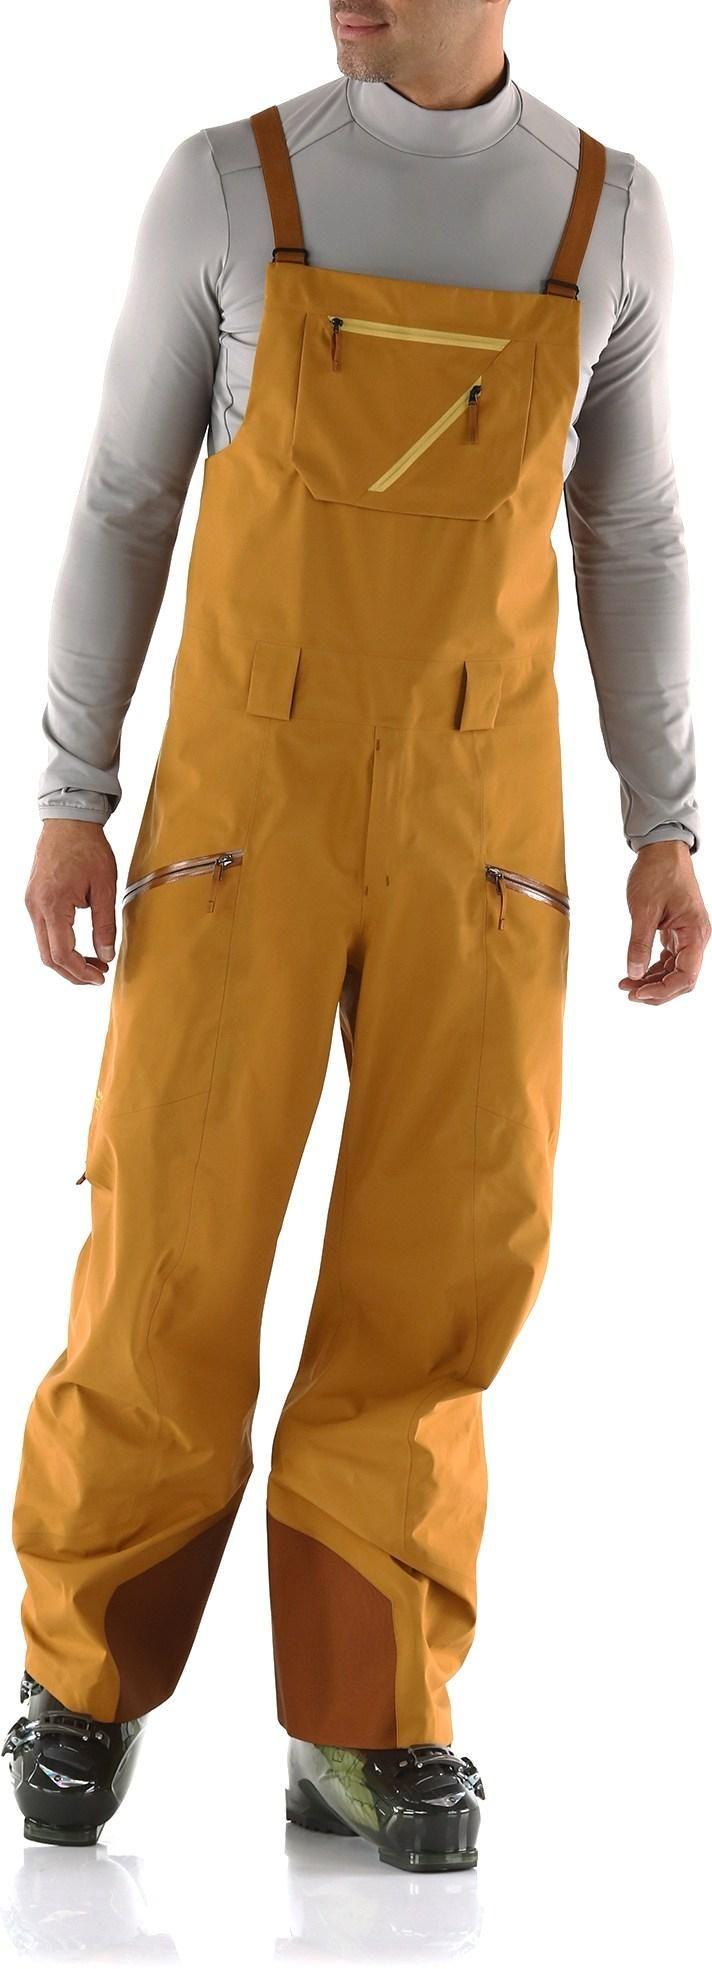 Arc'teryx Sabre Full-Bib Shell Pants - Men's.